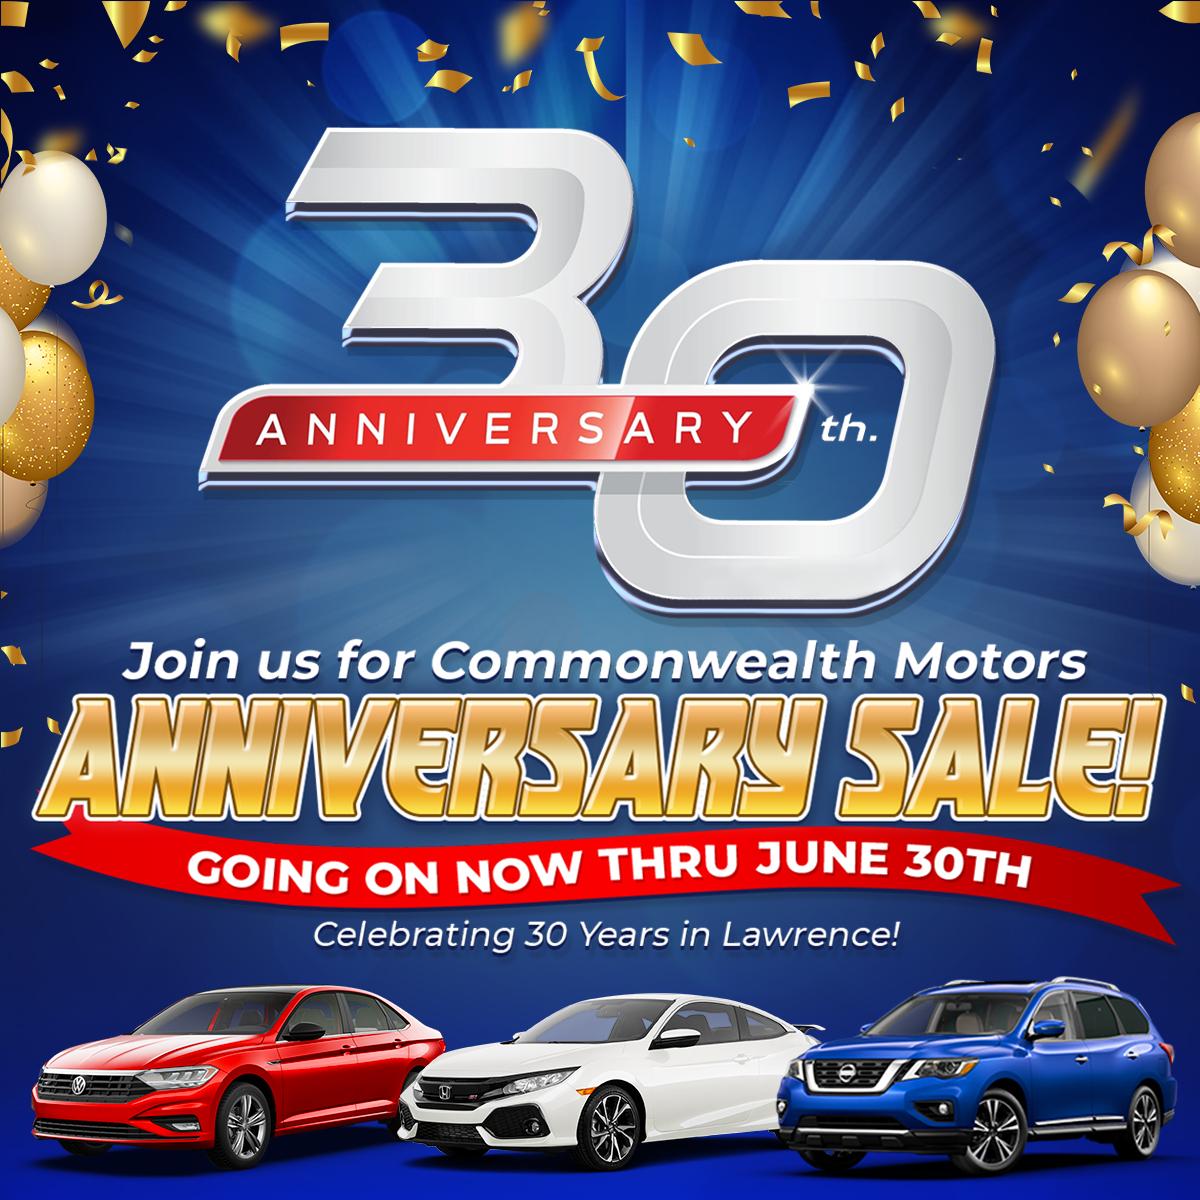 Commonwealth Motors 30th Anniversary